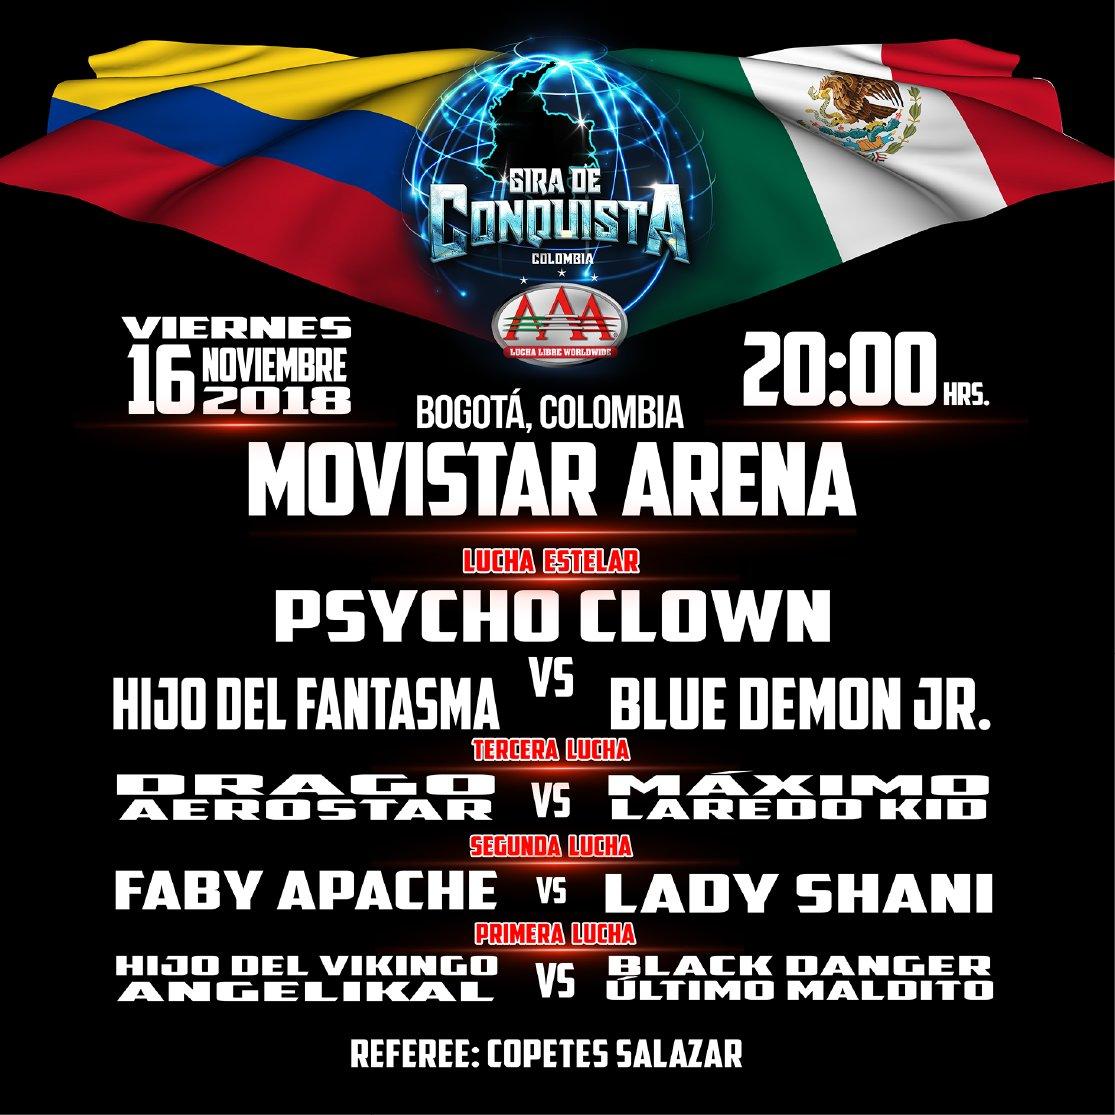 AAA: La Gira de Conquista arrasa en Bogotá 1